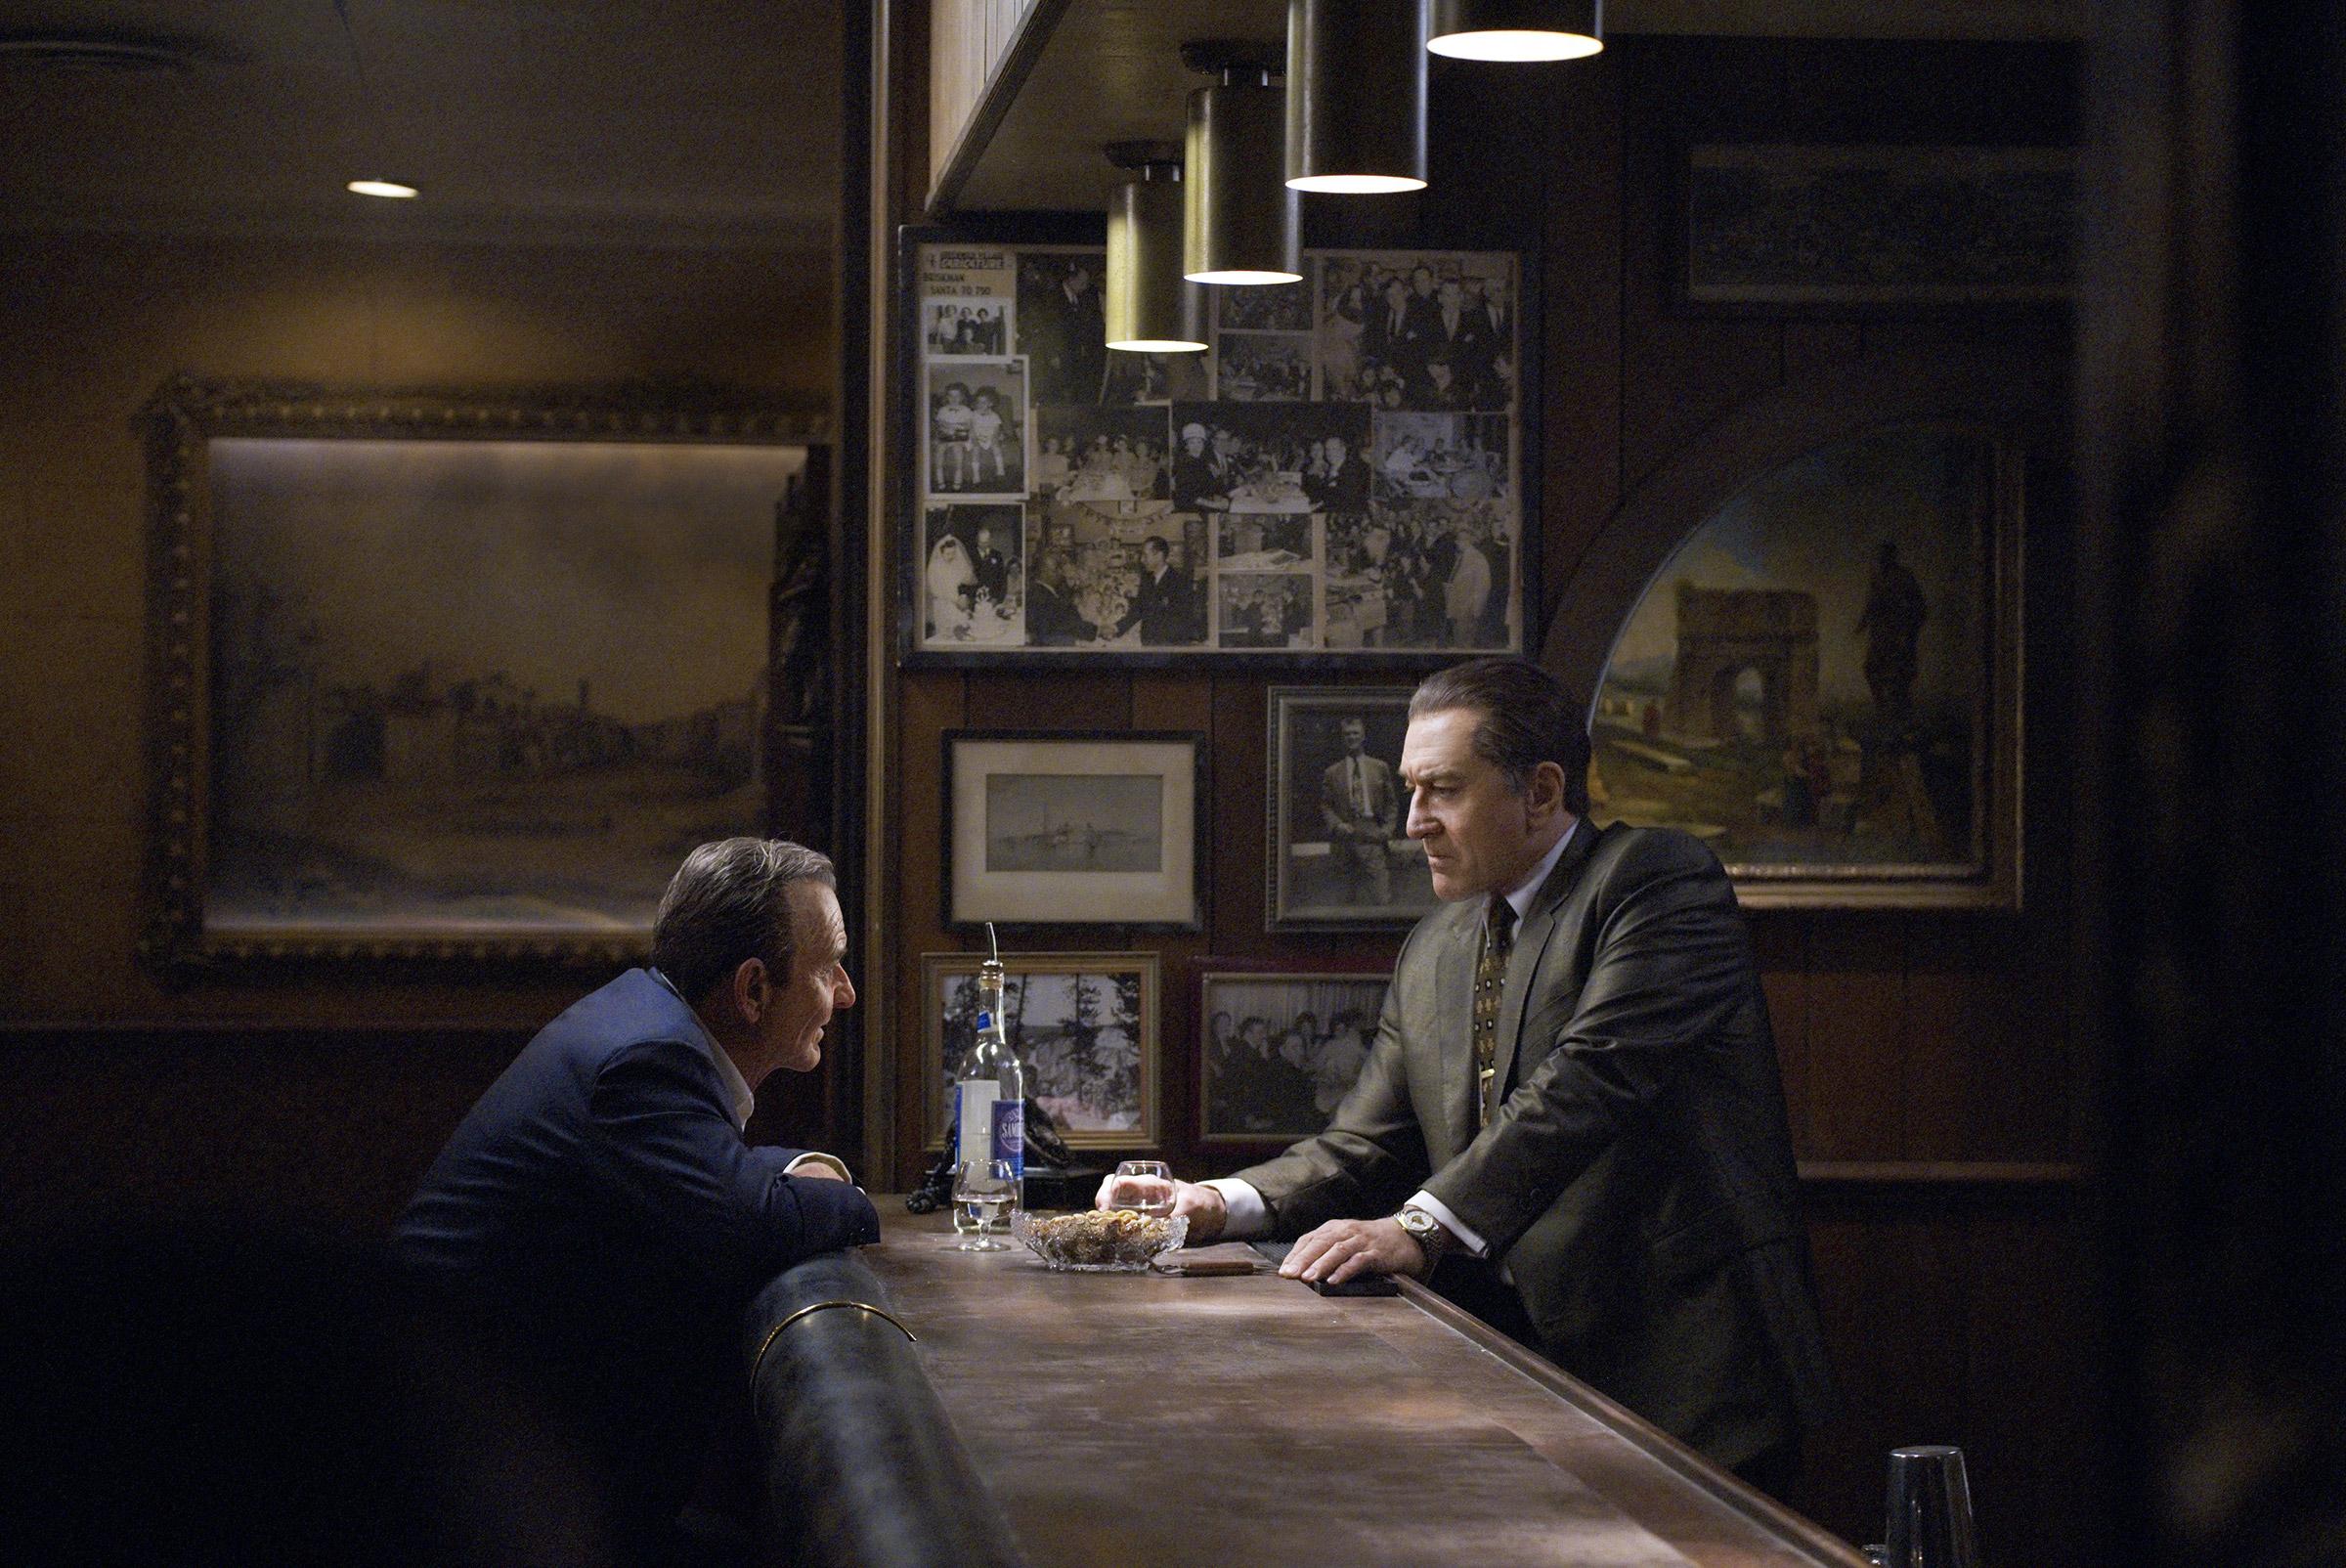 Joe Pesci and Robert De Niro in Martin Scorsese's Mob masterpiece The Irishman.